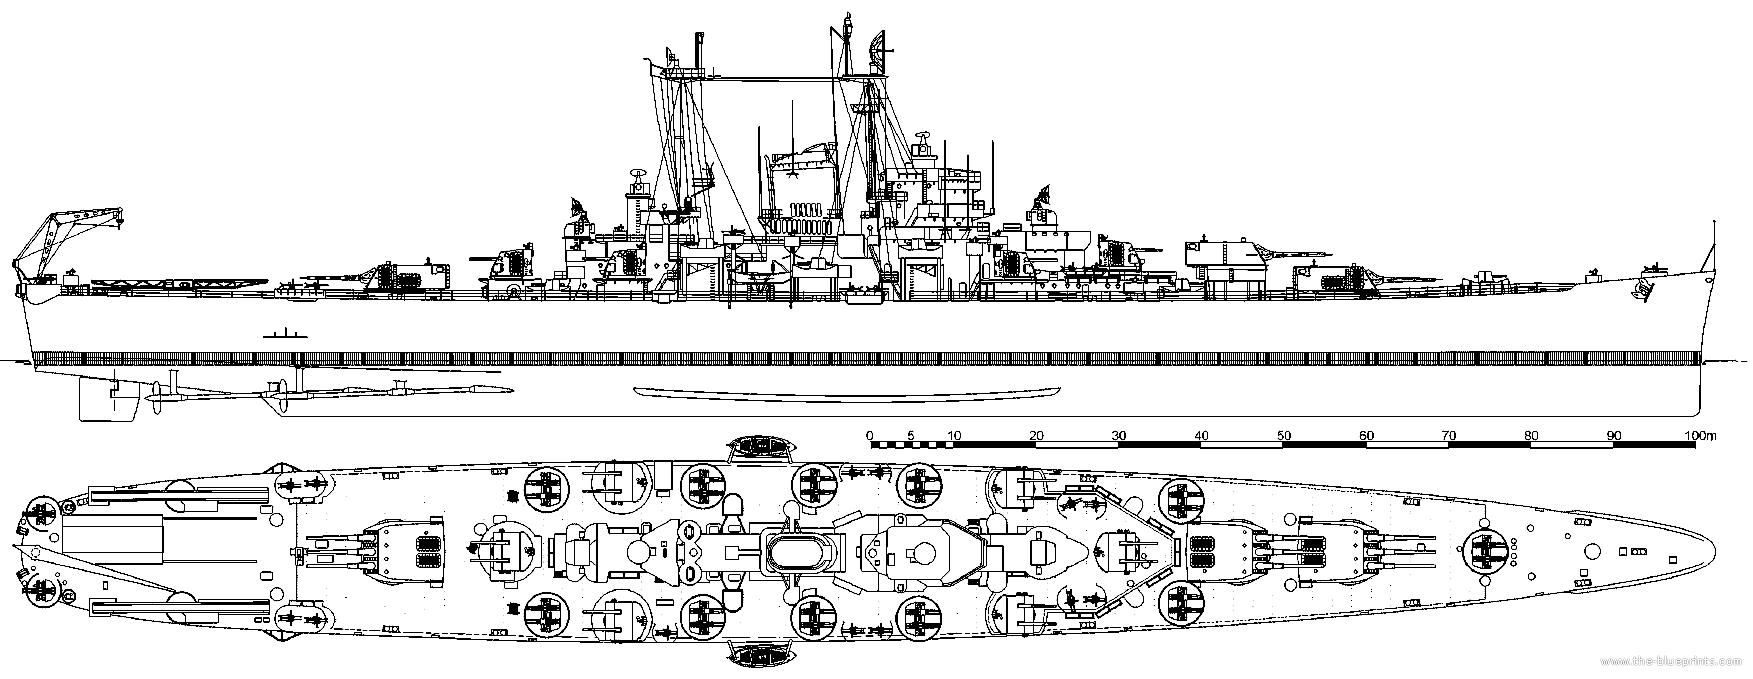 uss-ca-122-oregon-city-1946-heavy-cruise